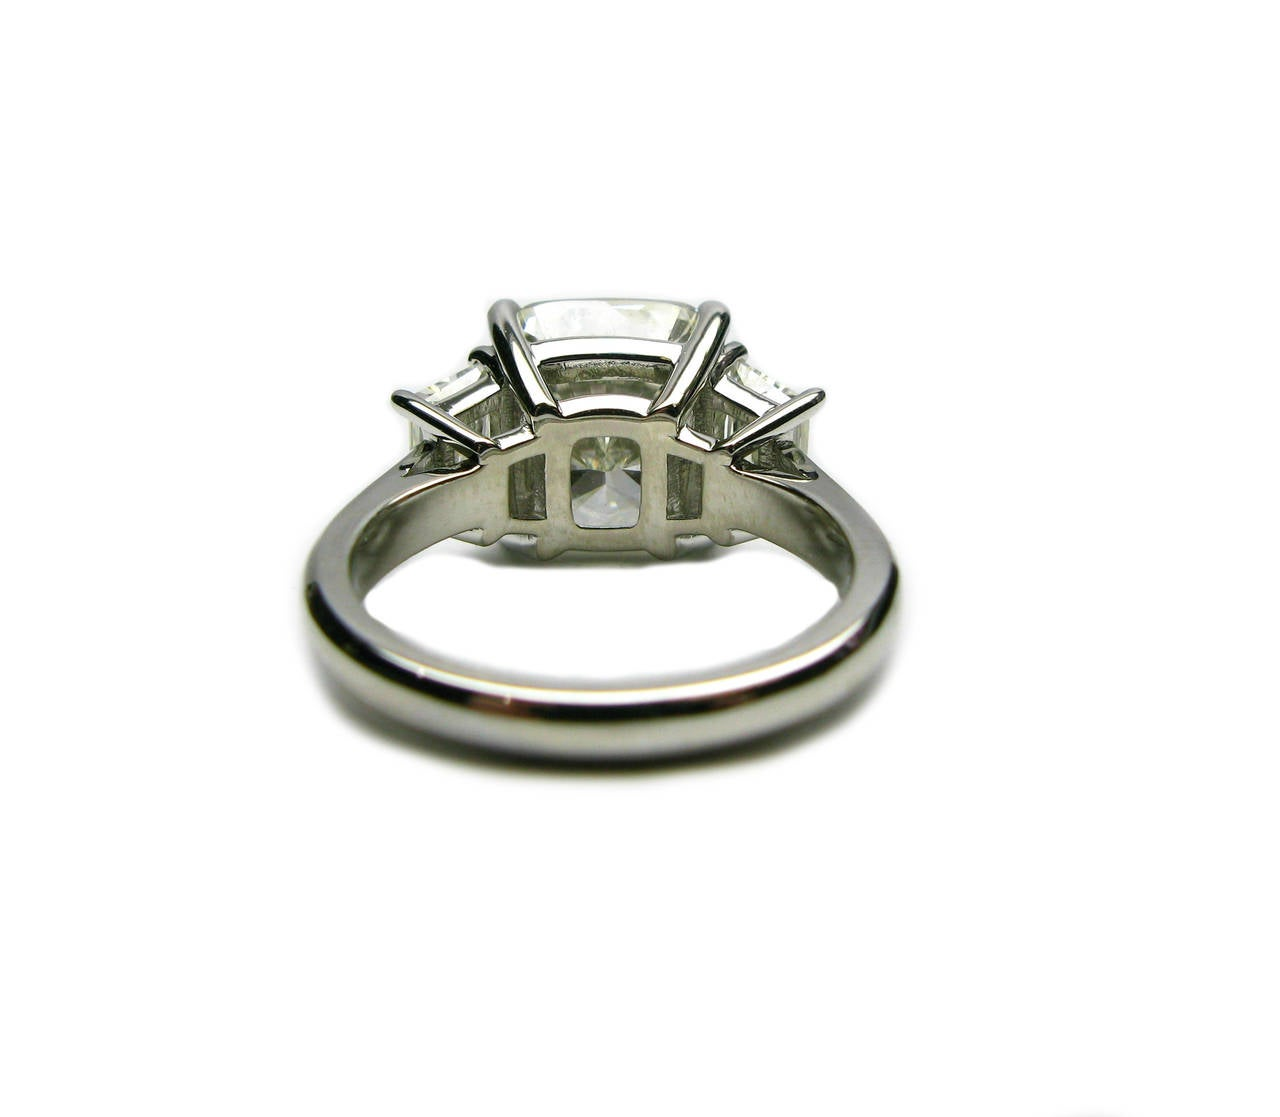 5.12 Carat Cushion Cut Diamond and Platinum Ring 3